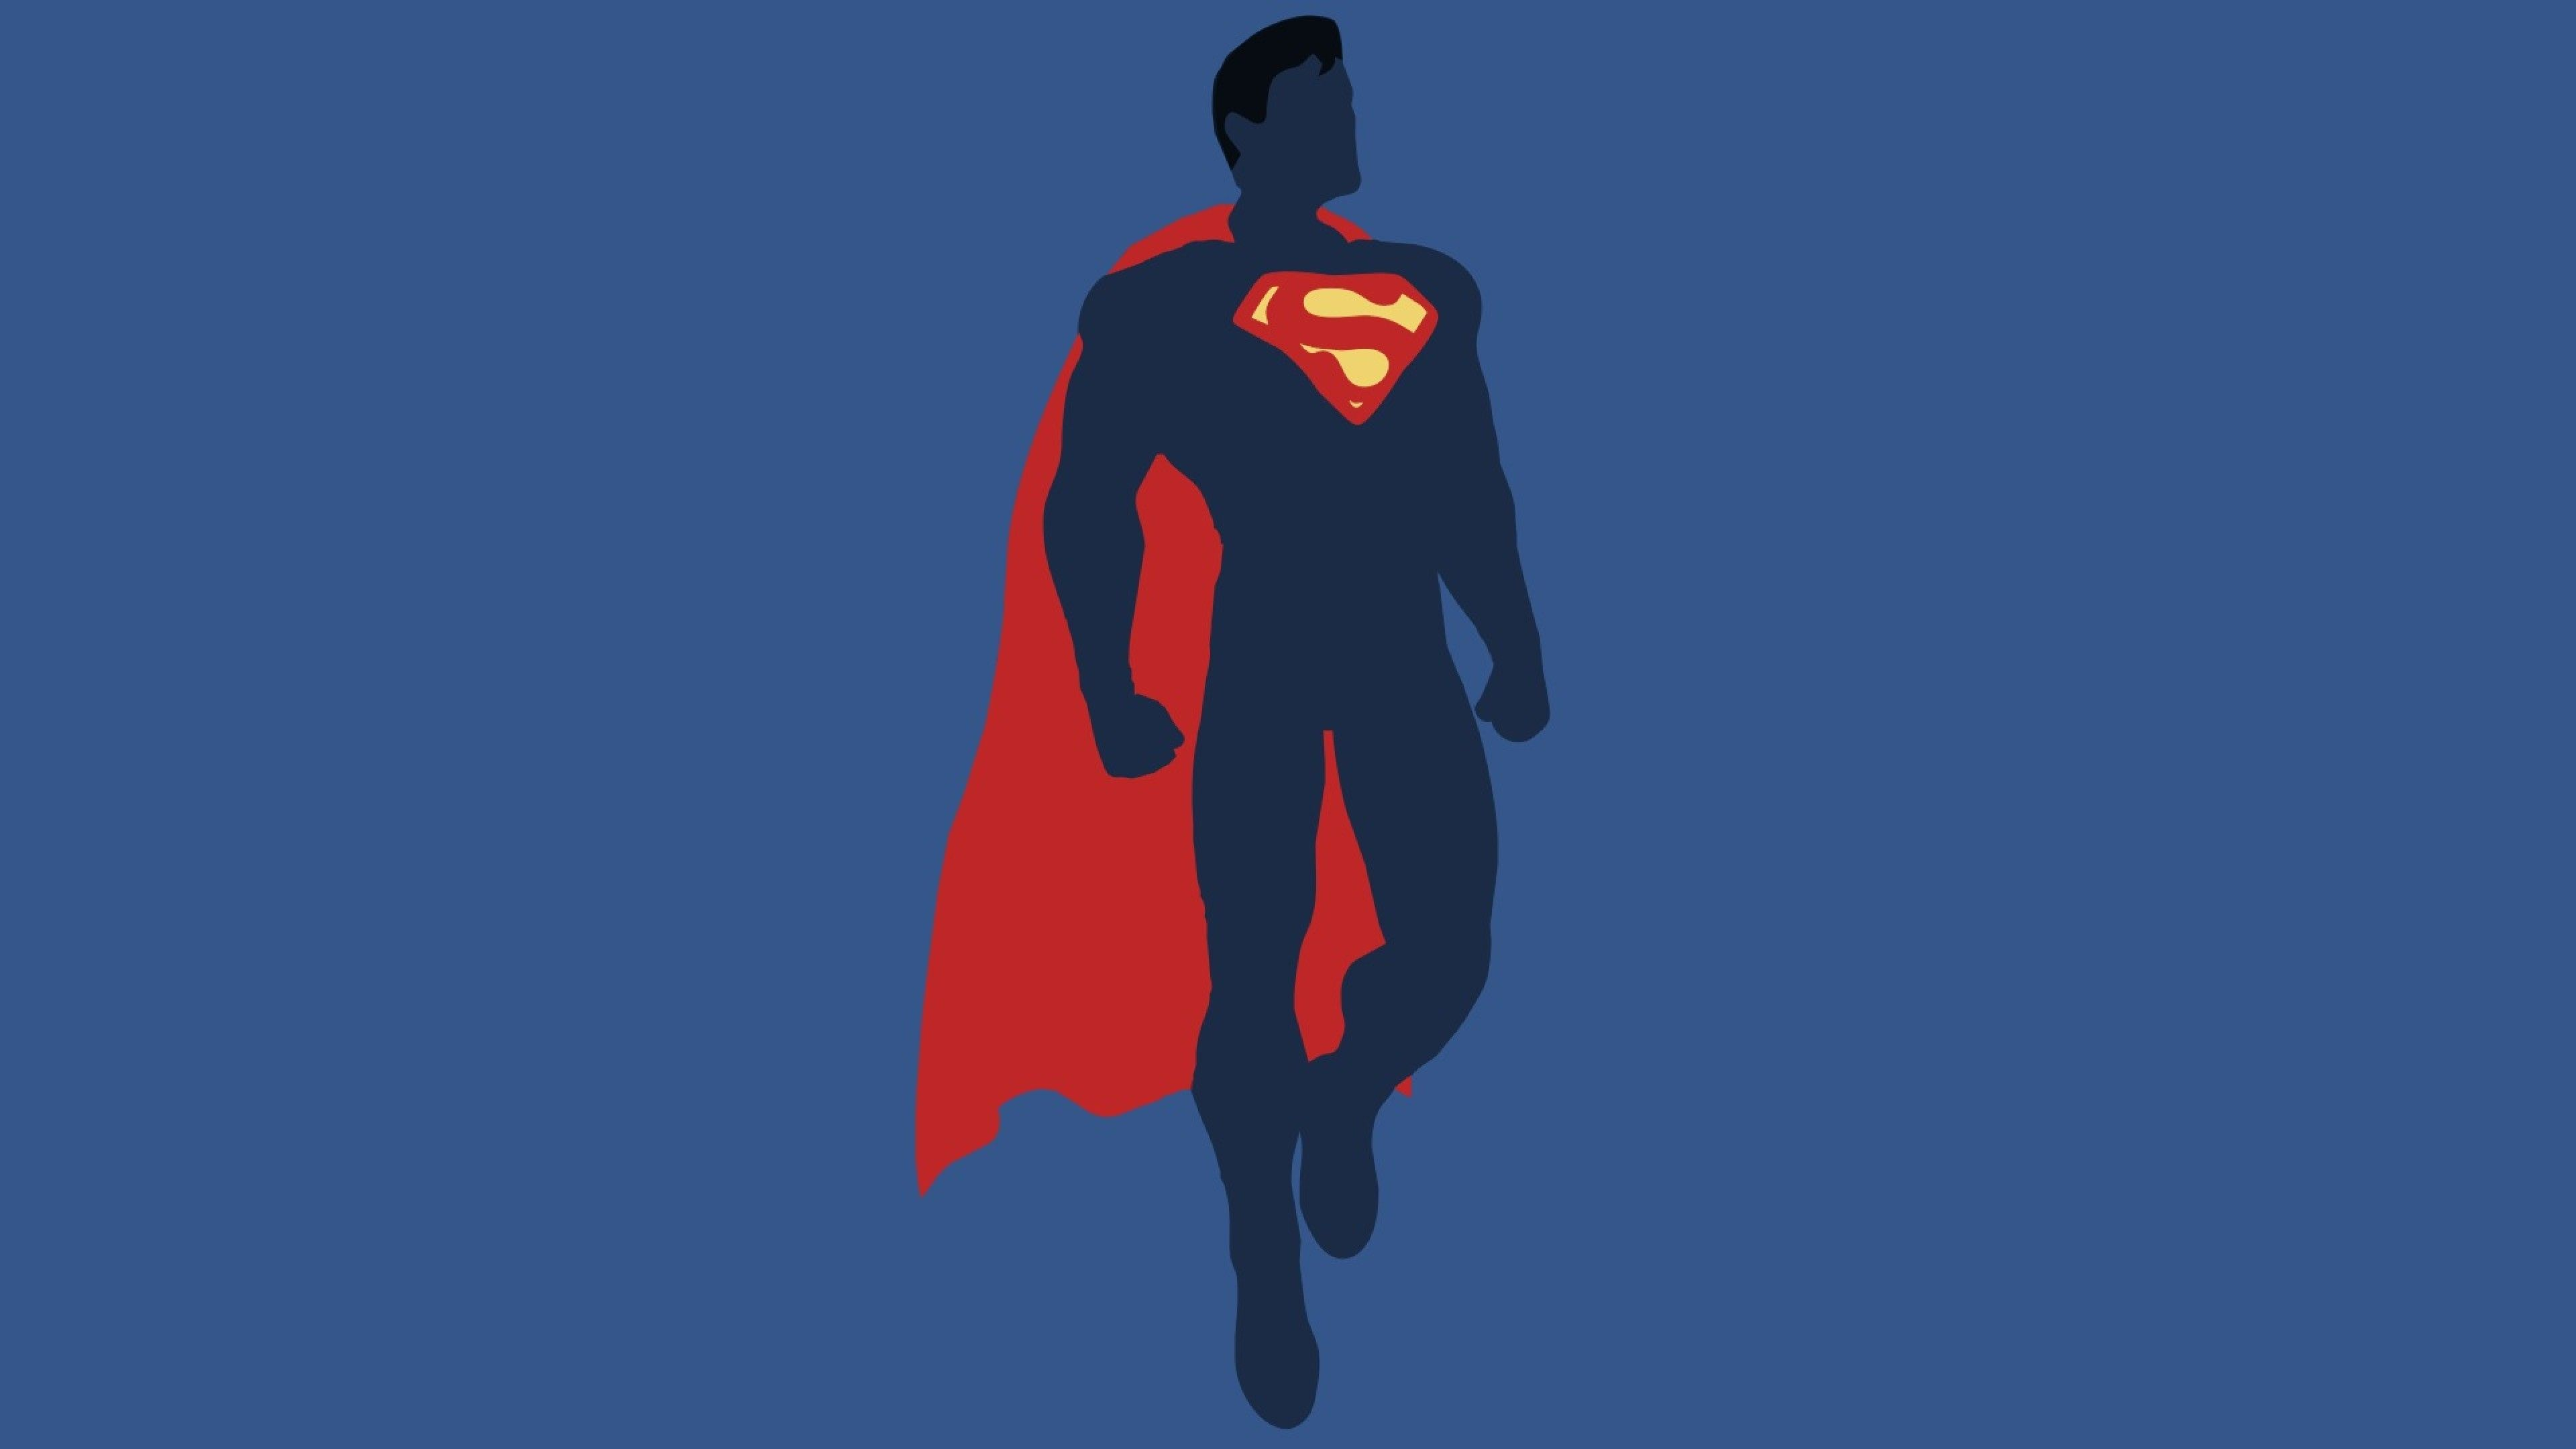 4K Superman Wallpapers - Top Free 4K